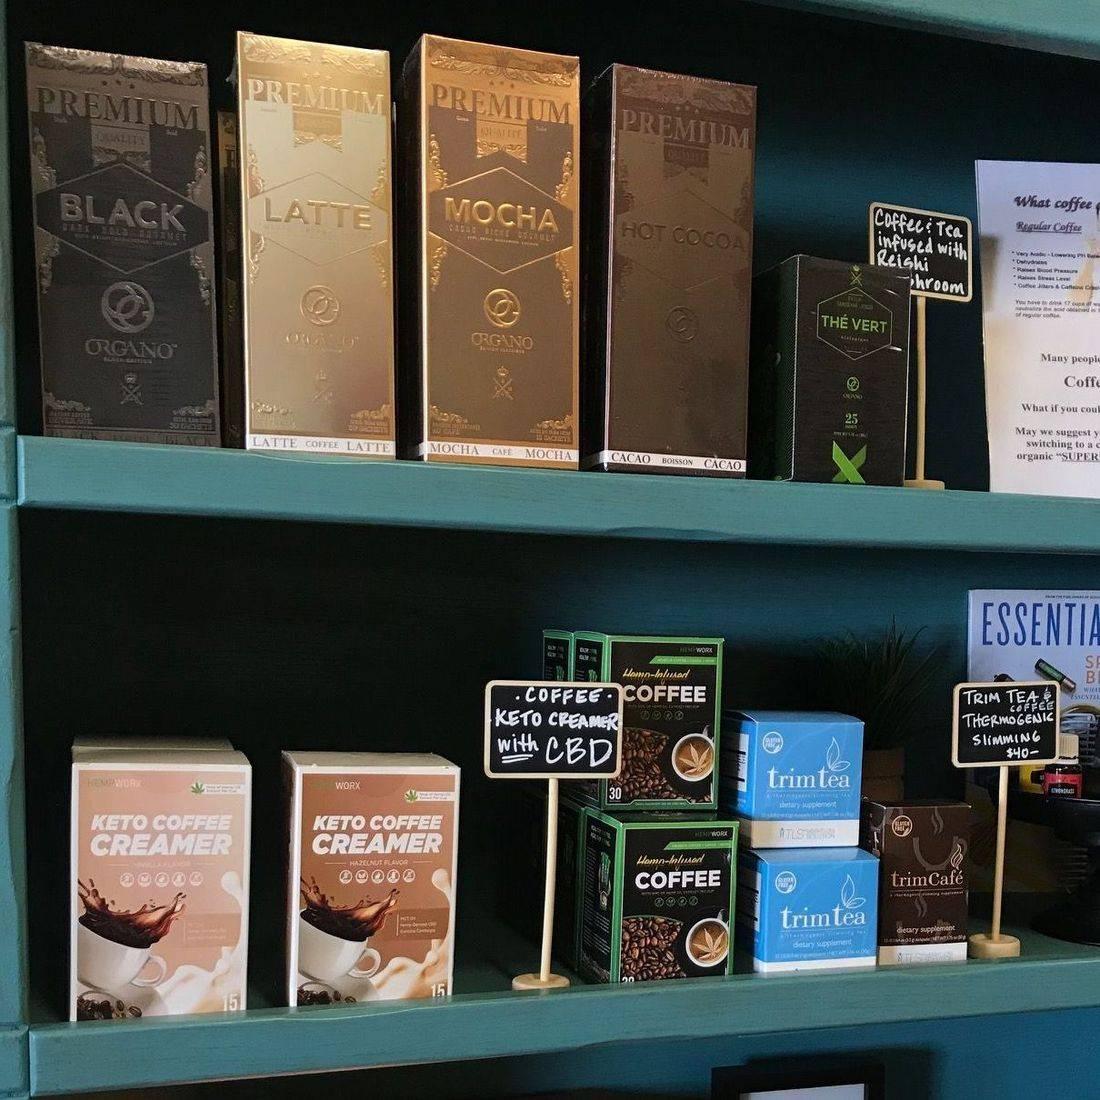 Hemp CBD Coffee & Organo Gold Coffee